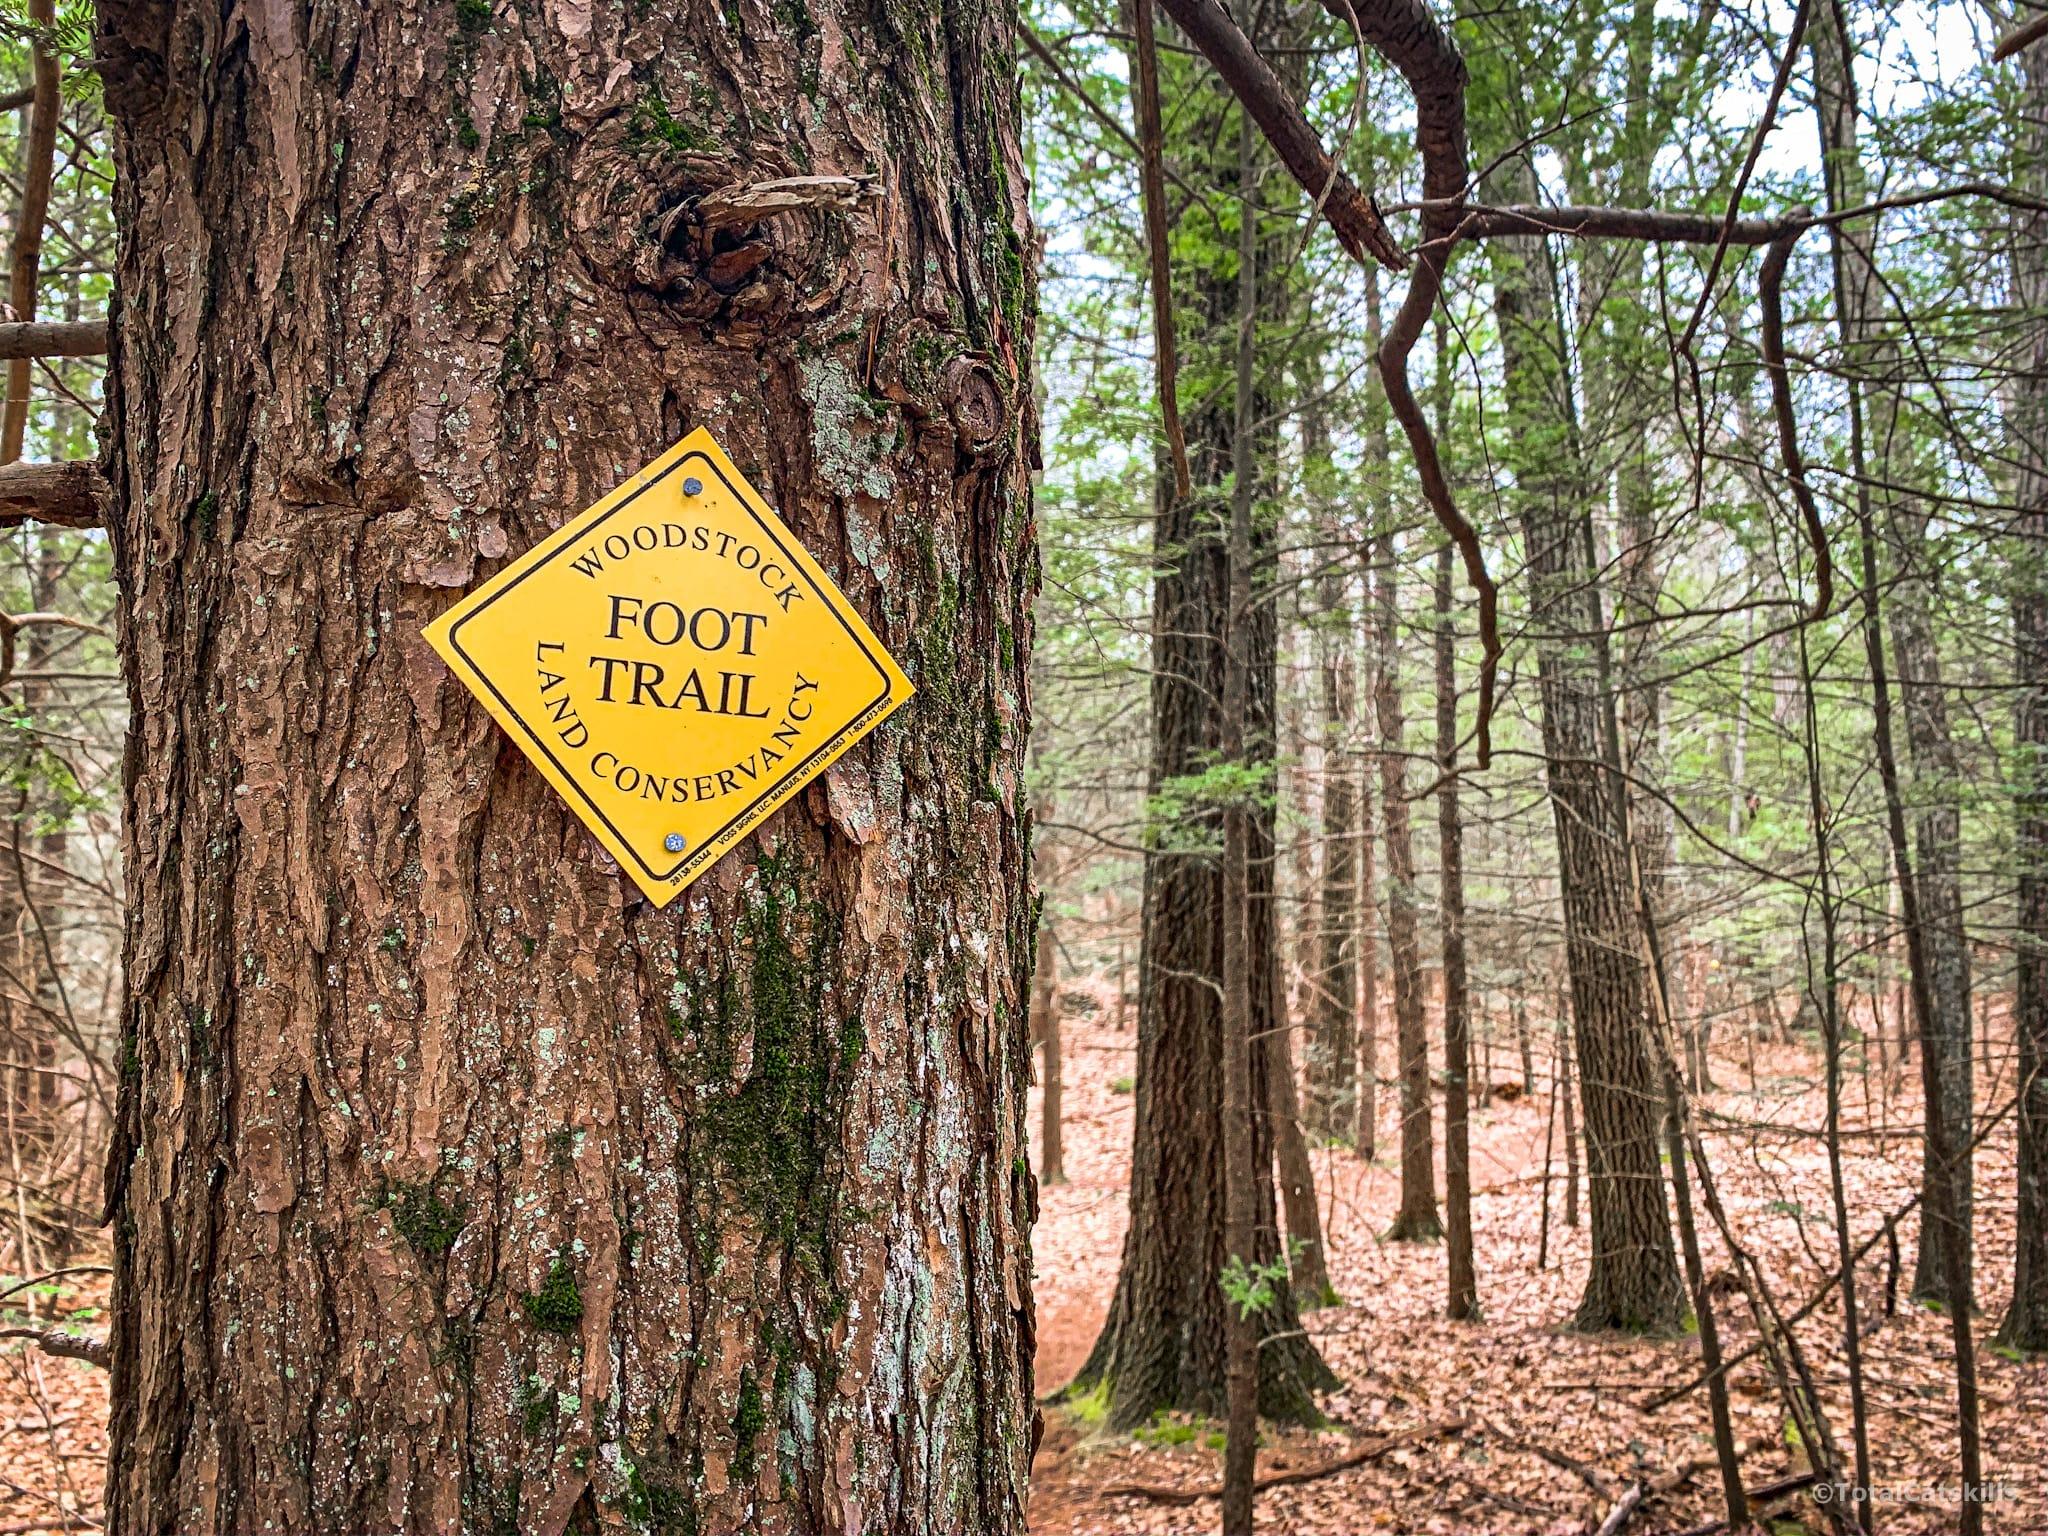 trail blaze on tree